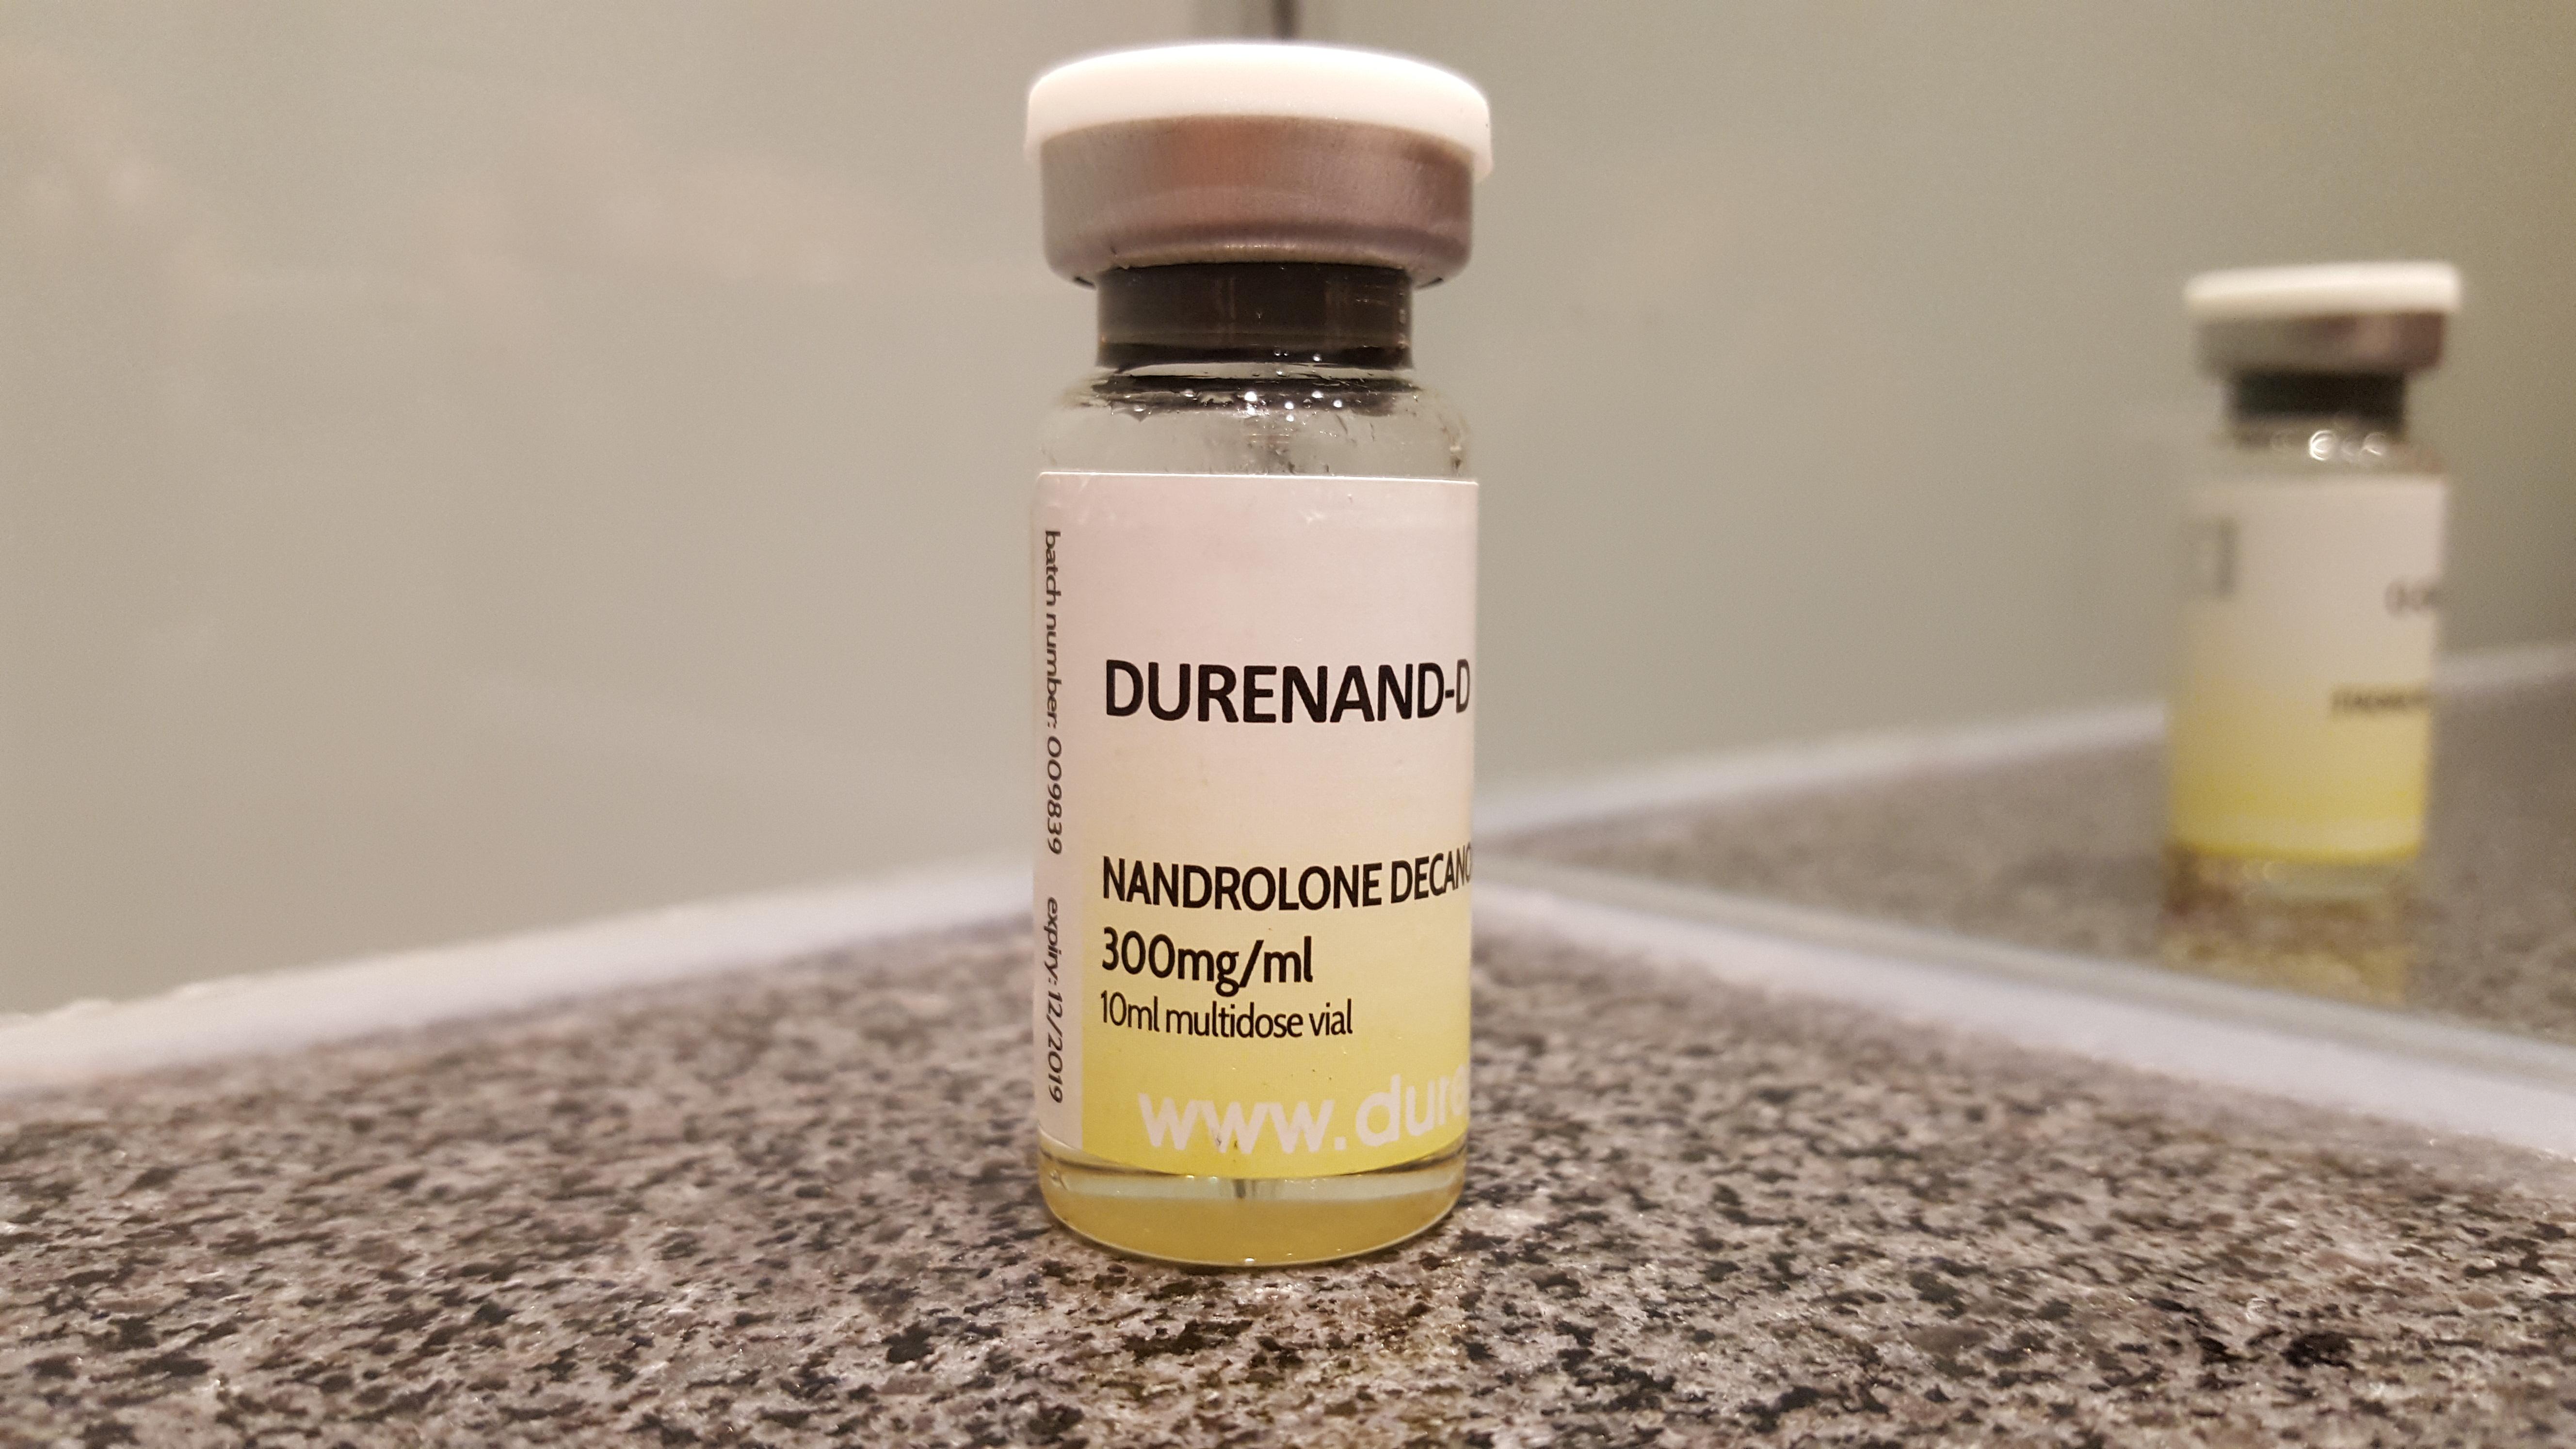 nandrolone brand name